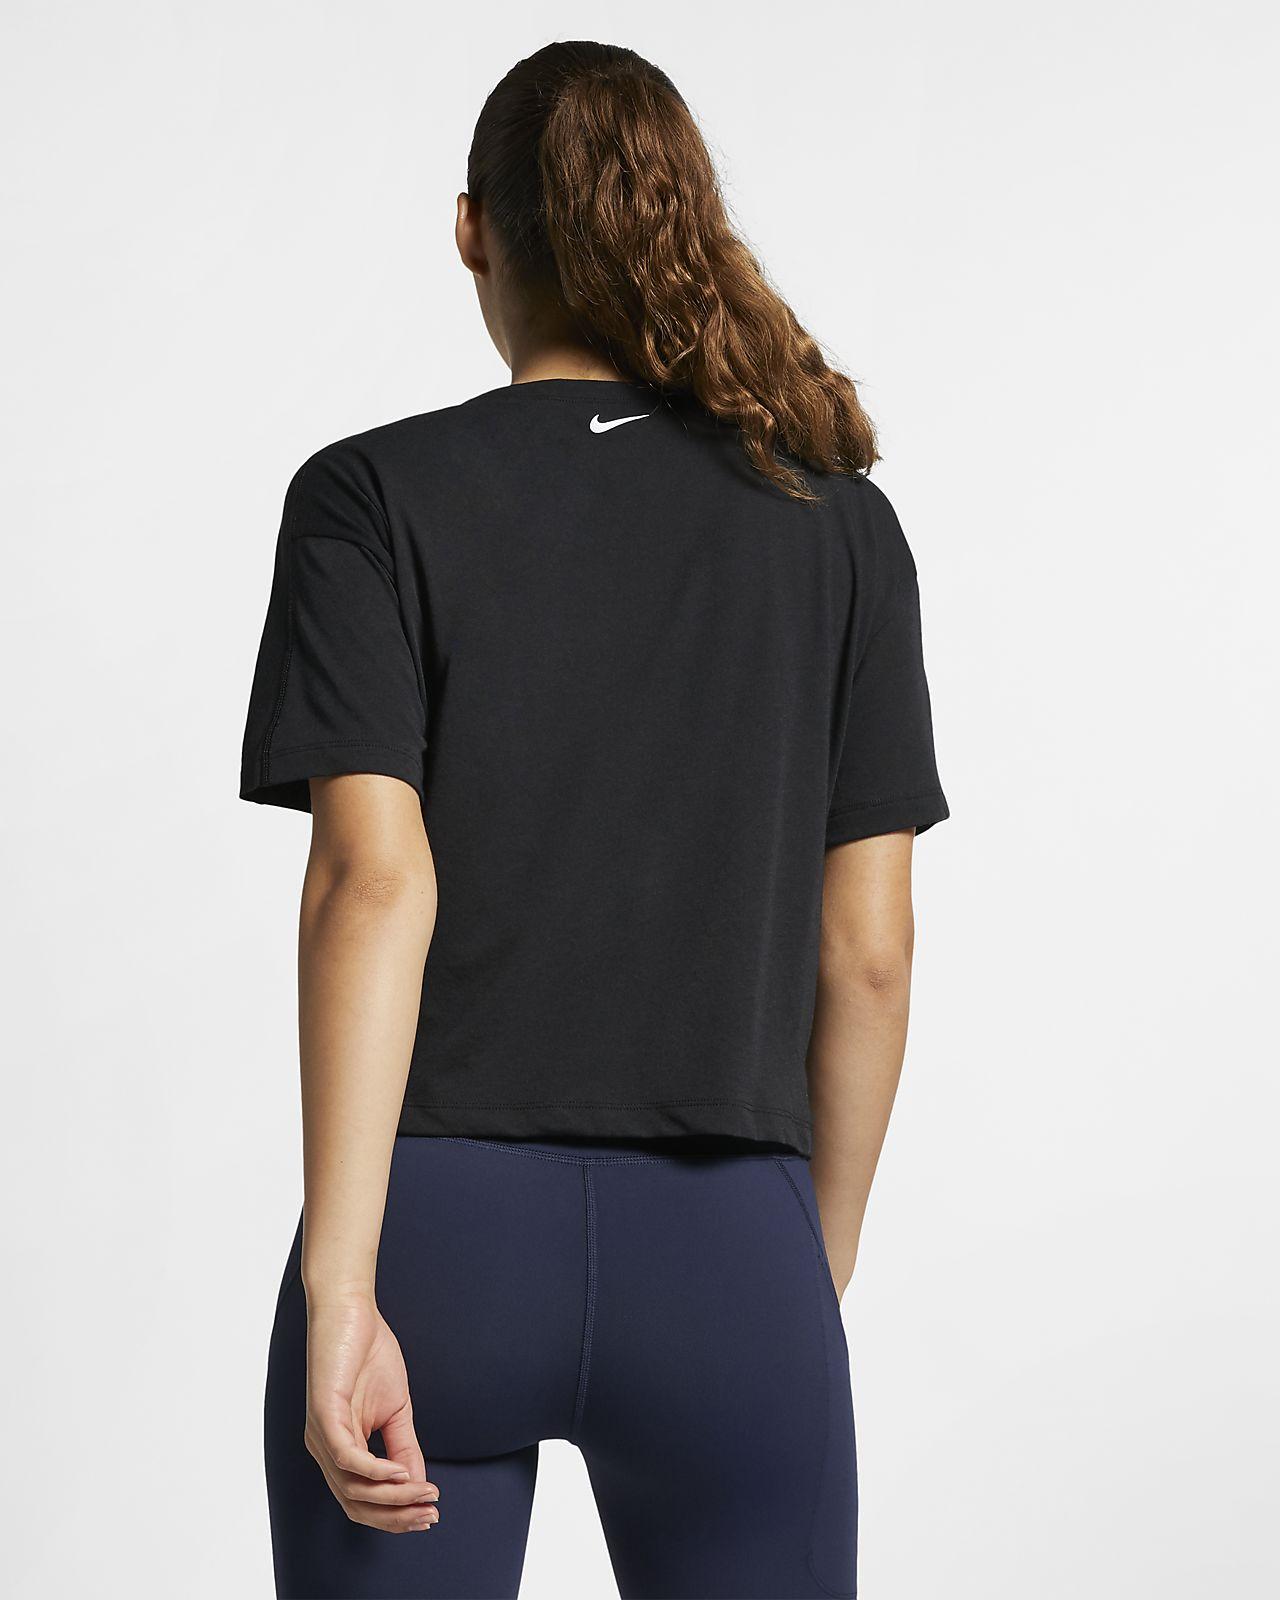 306e5e7617ad41 Camisola de running de manga curta Nike Dri-FIT Miler para mulher